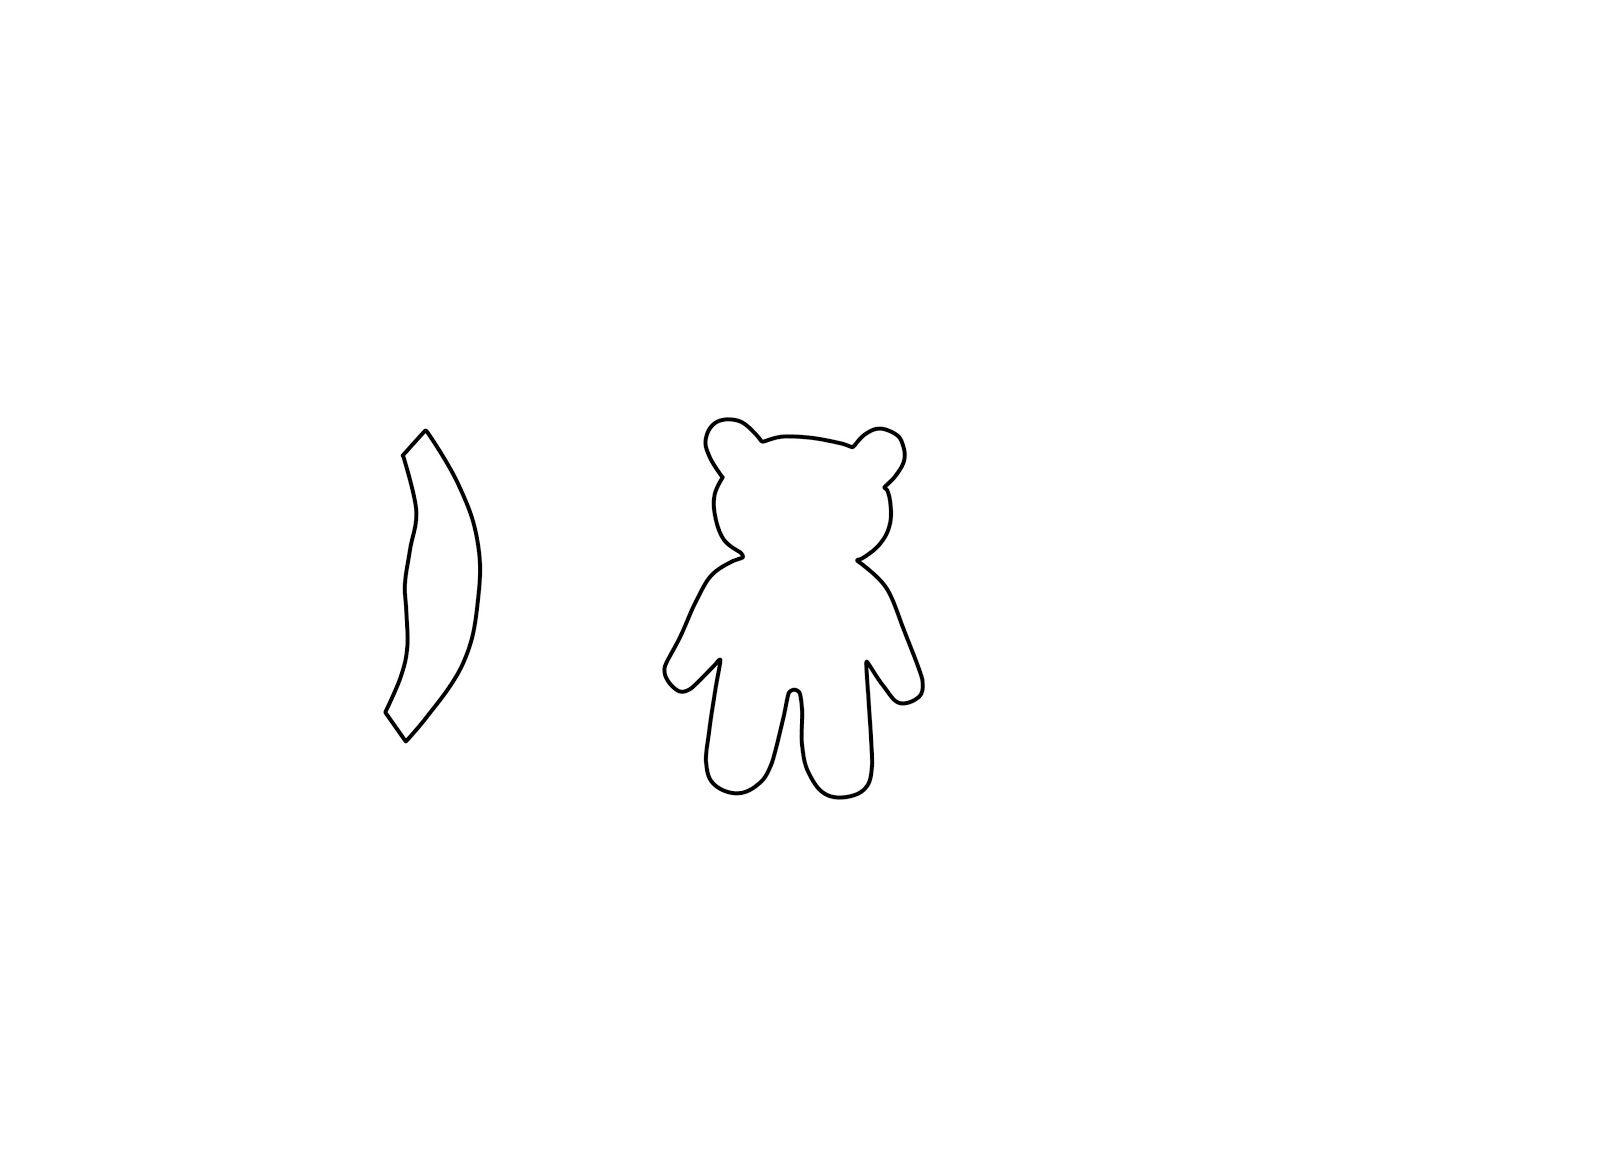 Pudsey Bear Template | Sewing | Pinterest | Bear template, Template ...